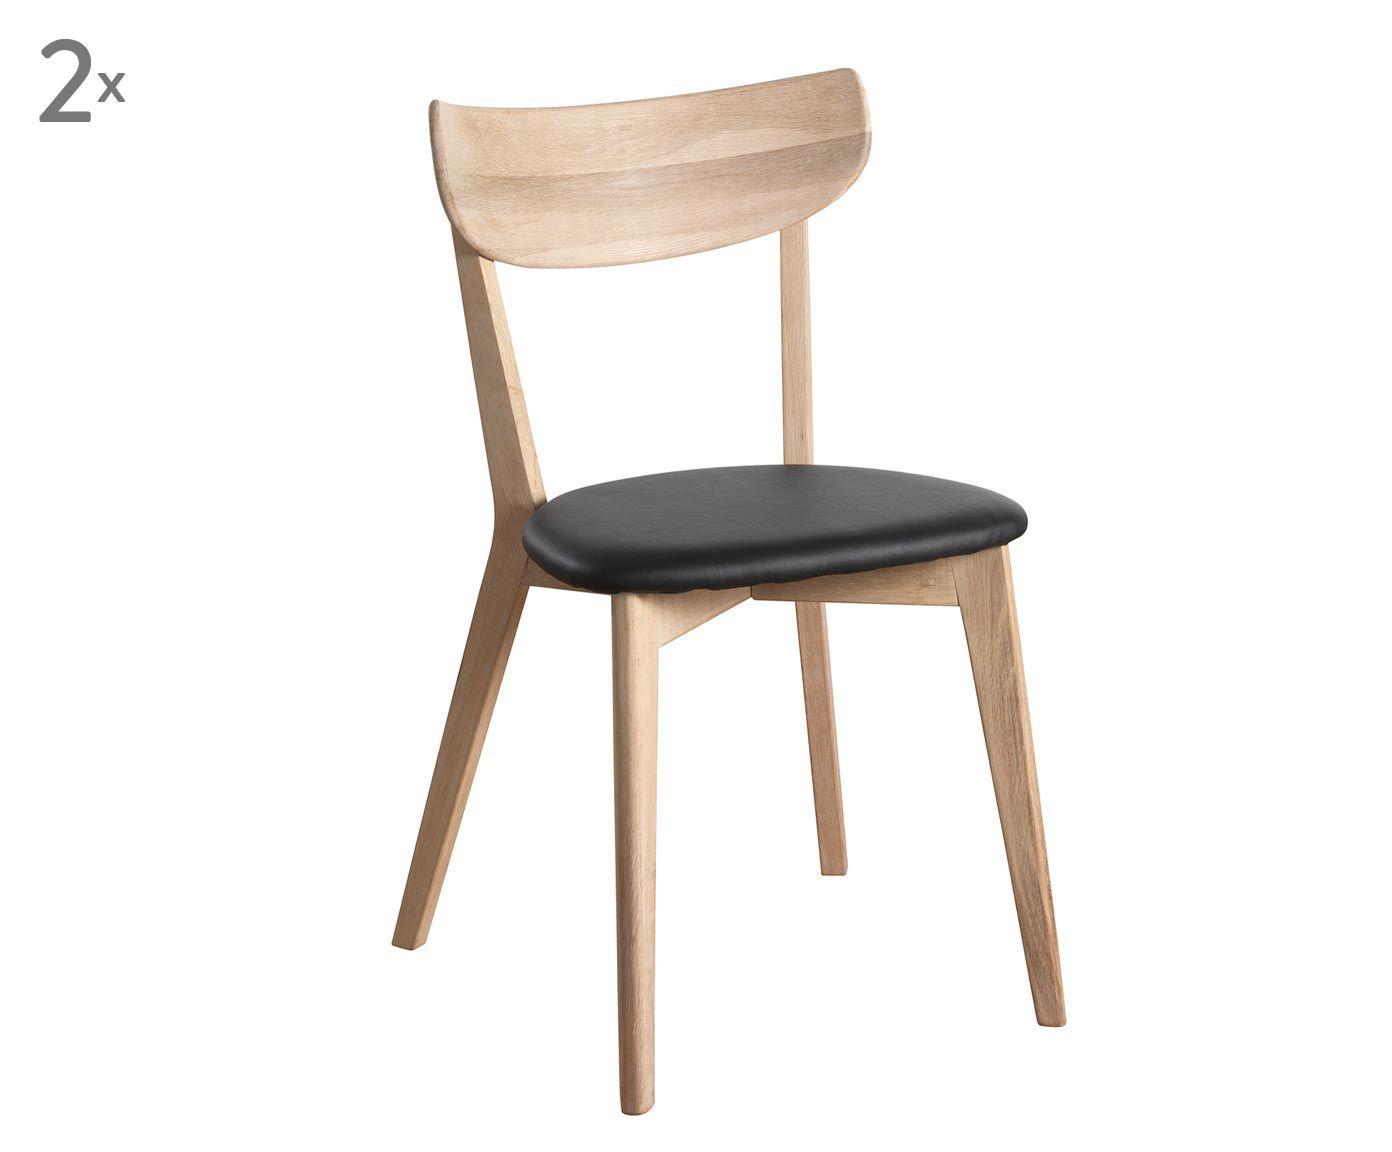 Großzügig Helle Farbige Küchenstuhl Kissen Ideen - Küche Set Ideen ...